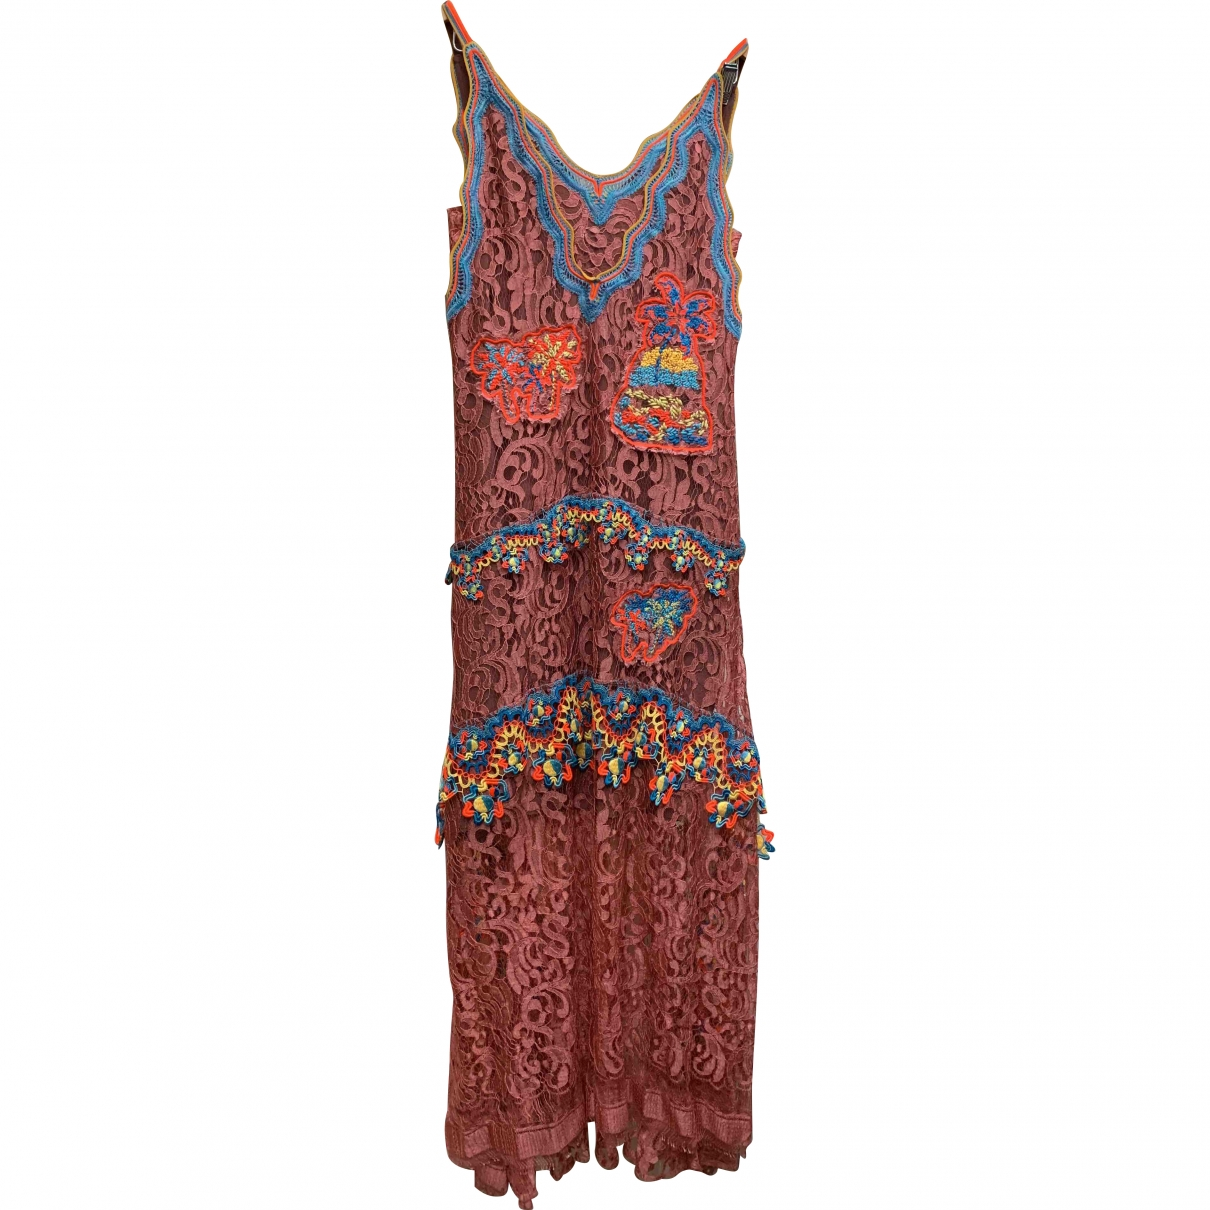 Peter Pilotto \N Multicolour dress for Women 6 UK